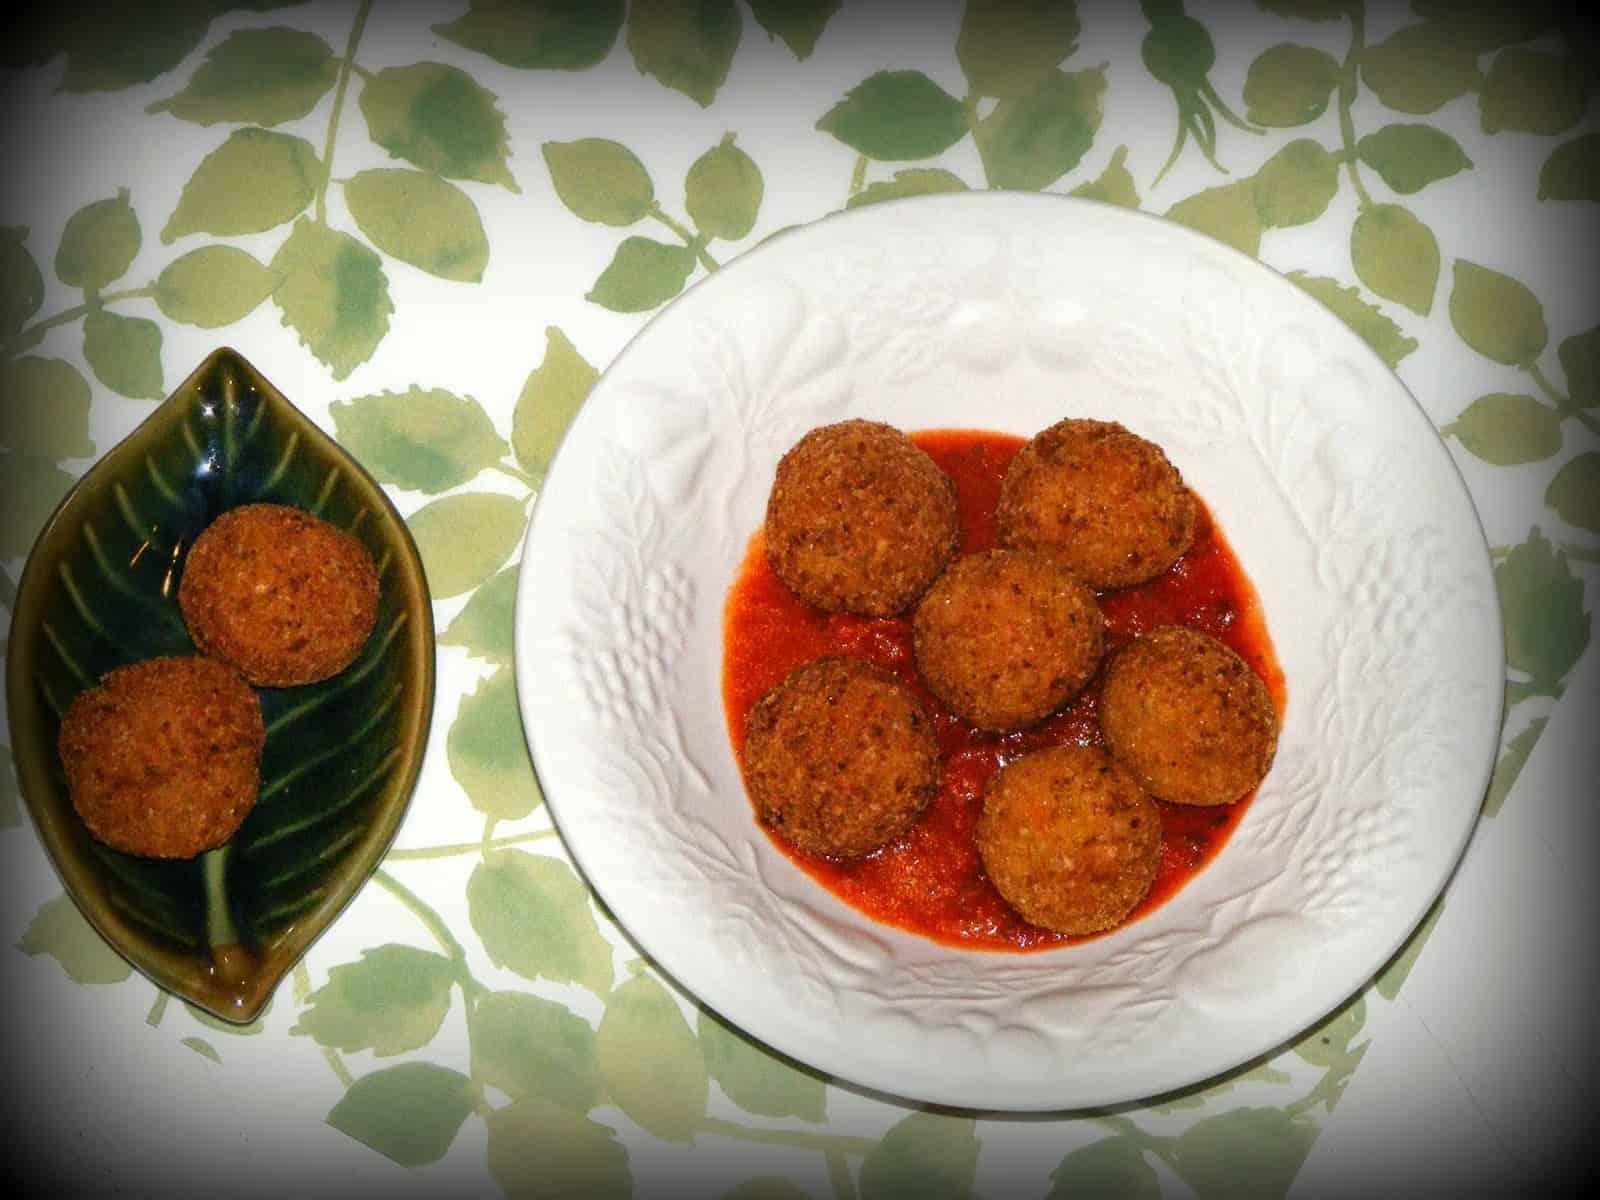 Arancini – An Italian Street Food